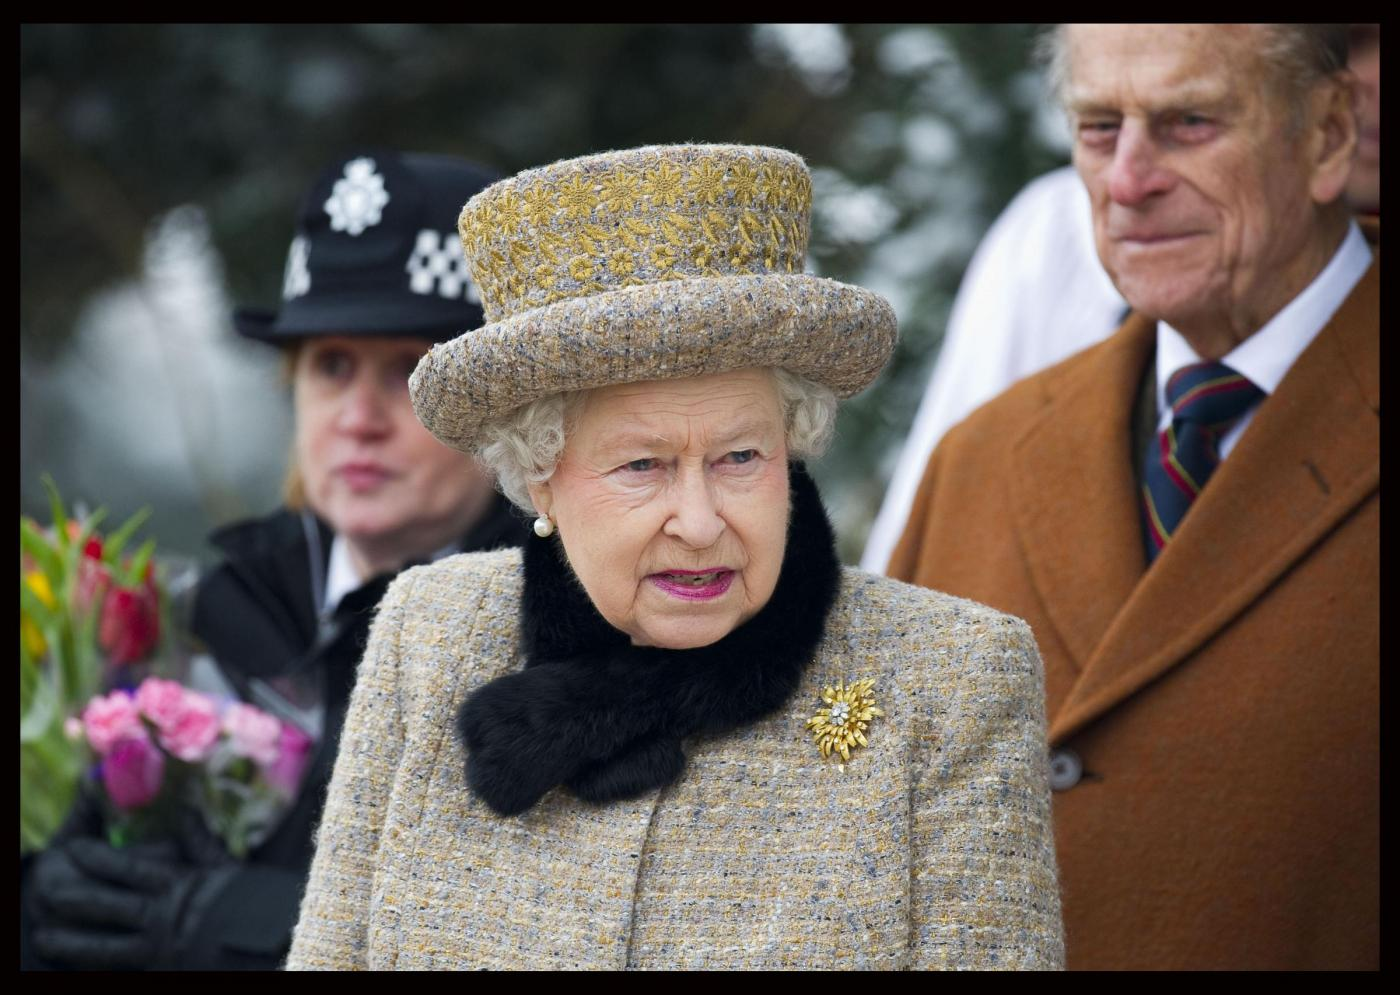 Elisabetta II, regina d'Inghilterra, nelle sue vene sangue di Maometto?